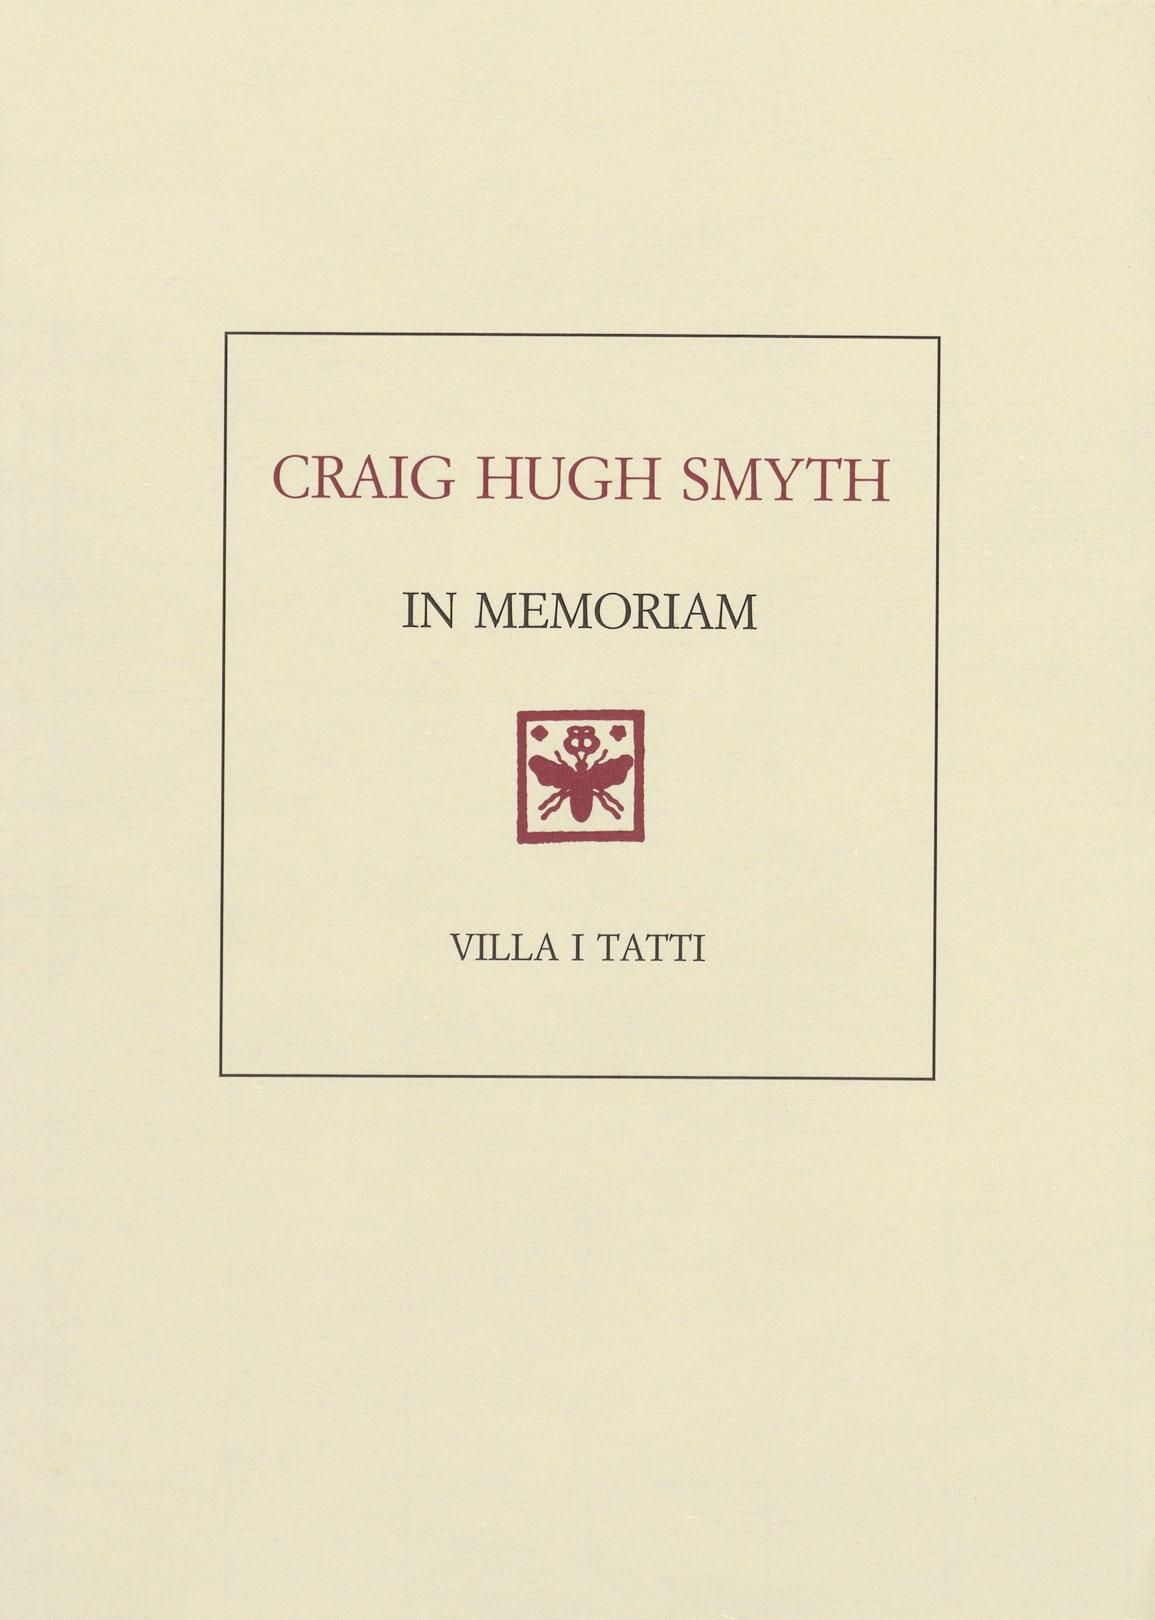 Craig Hugh Smyth--In Memoriam